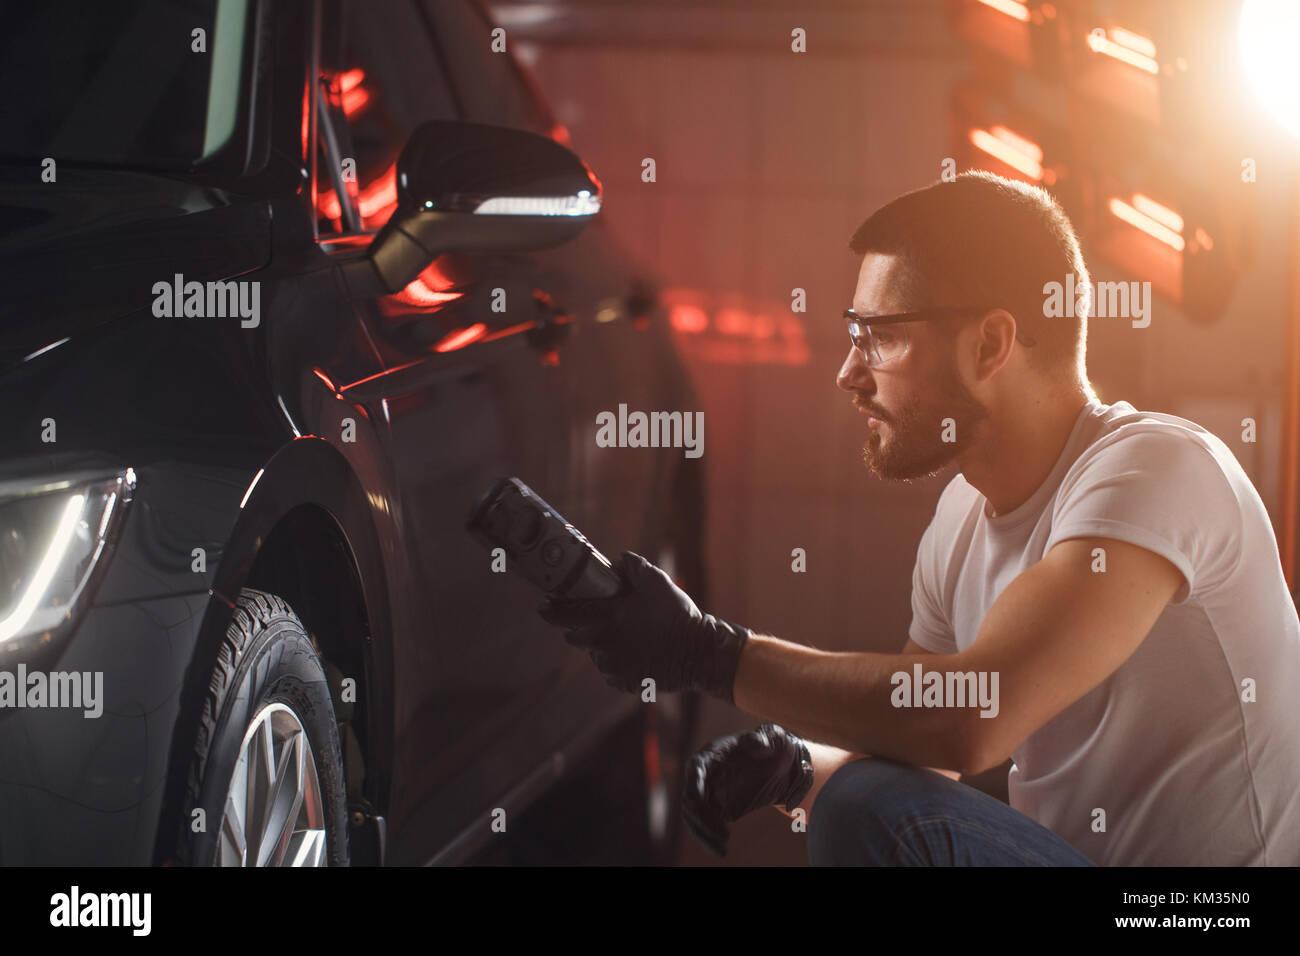 man checks polishing with a torch - Stock Image